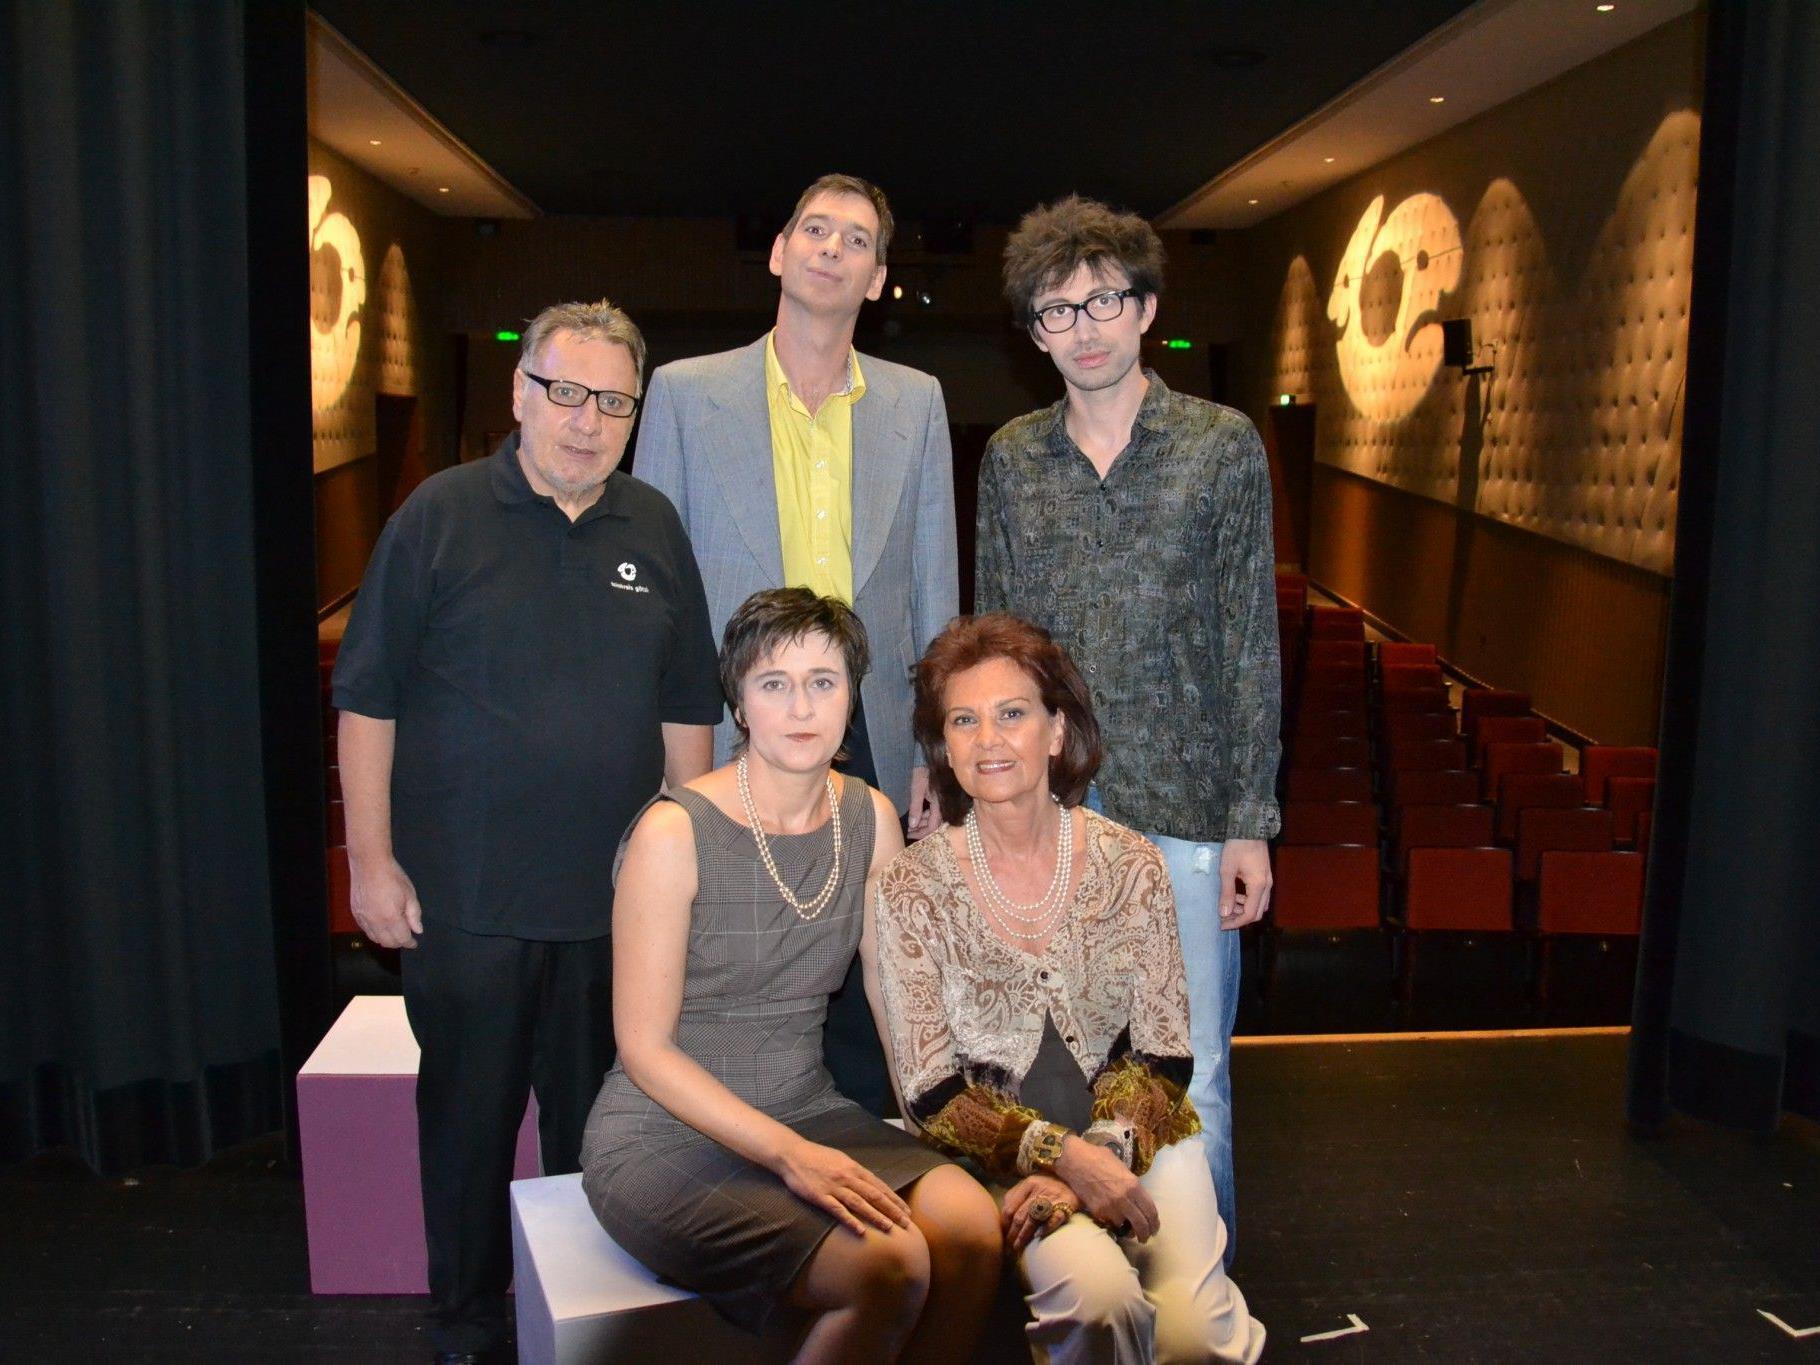 Die Schauspieler mit ihrem Regisseur: Hansjörg Ellensohn (li.), Jürgen Reiner, Andreas Kopf, Karin Klas & Dodo Büchel